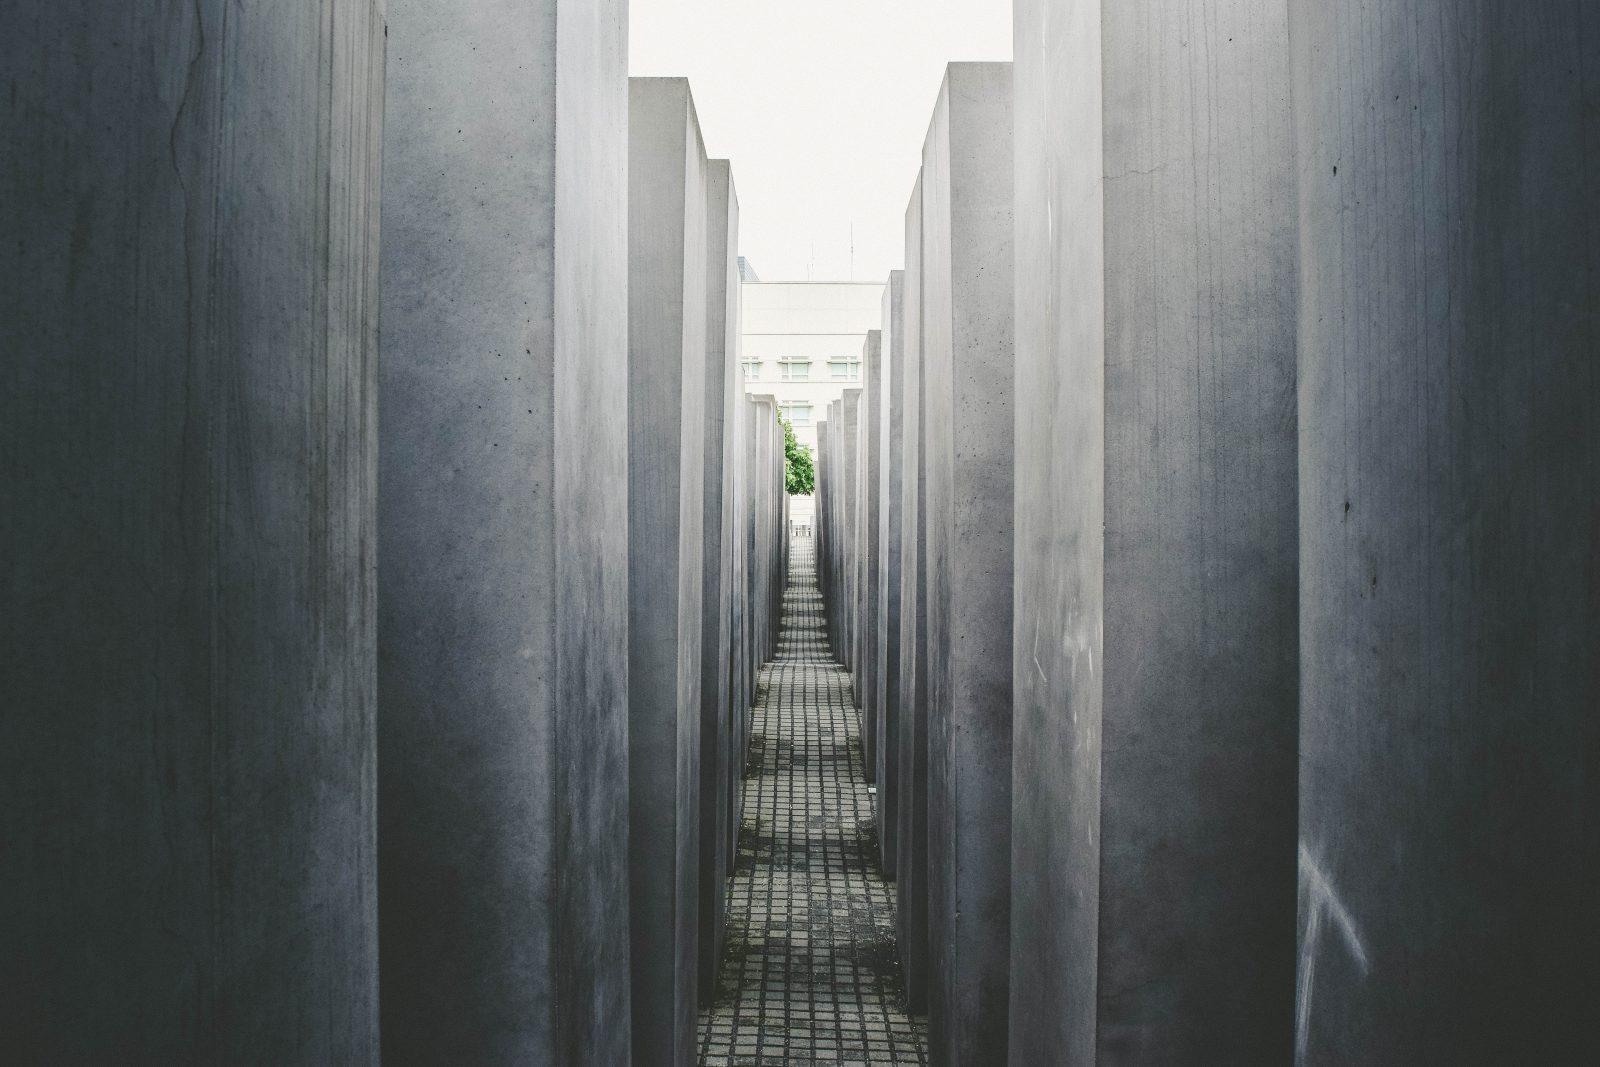 eu6ue9y1jei - 9/11 Memorial and Museum